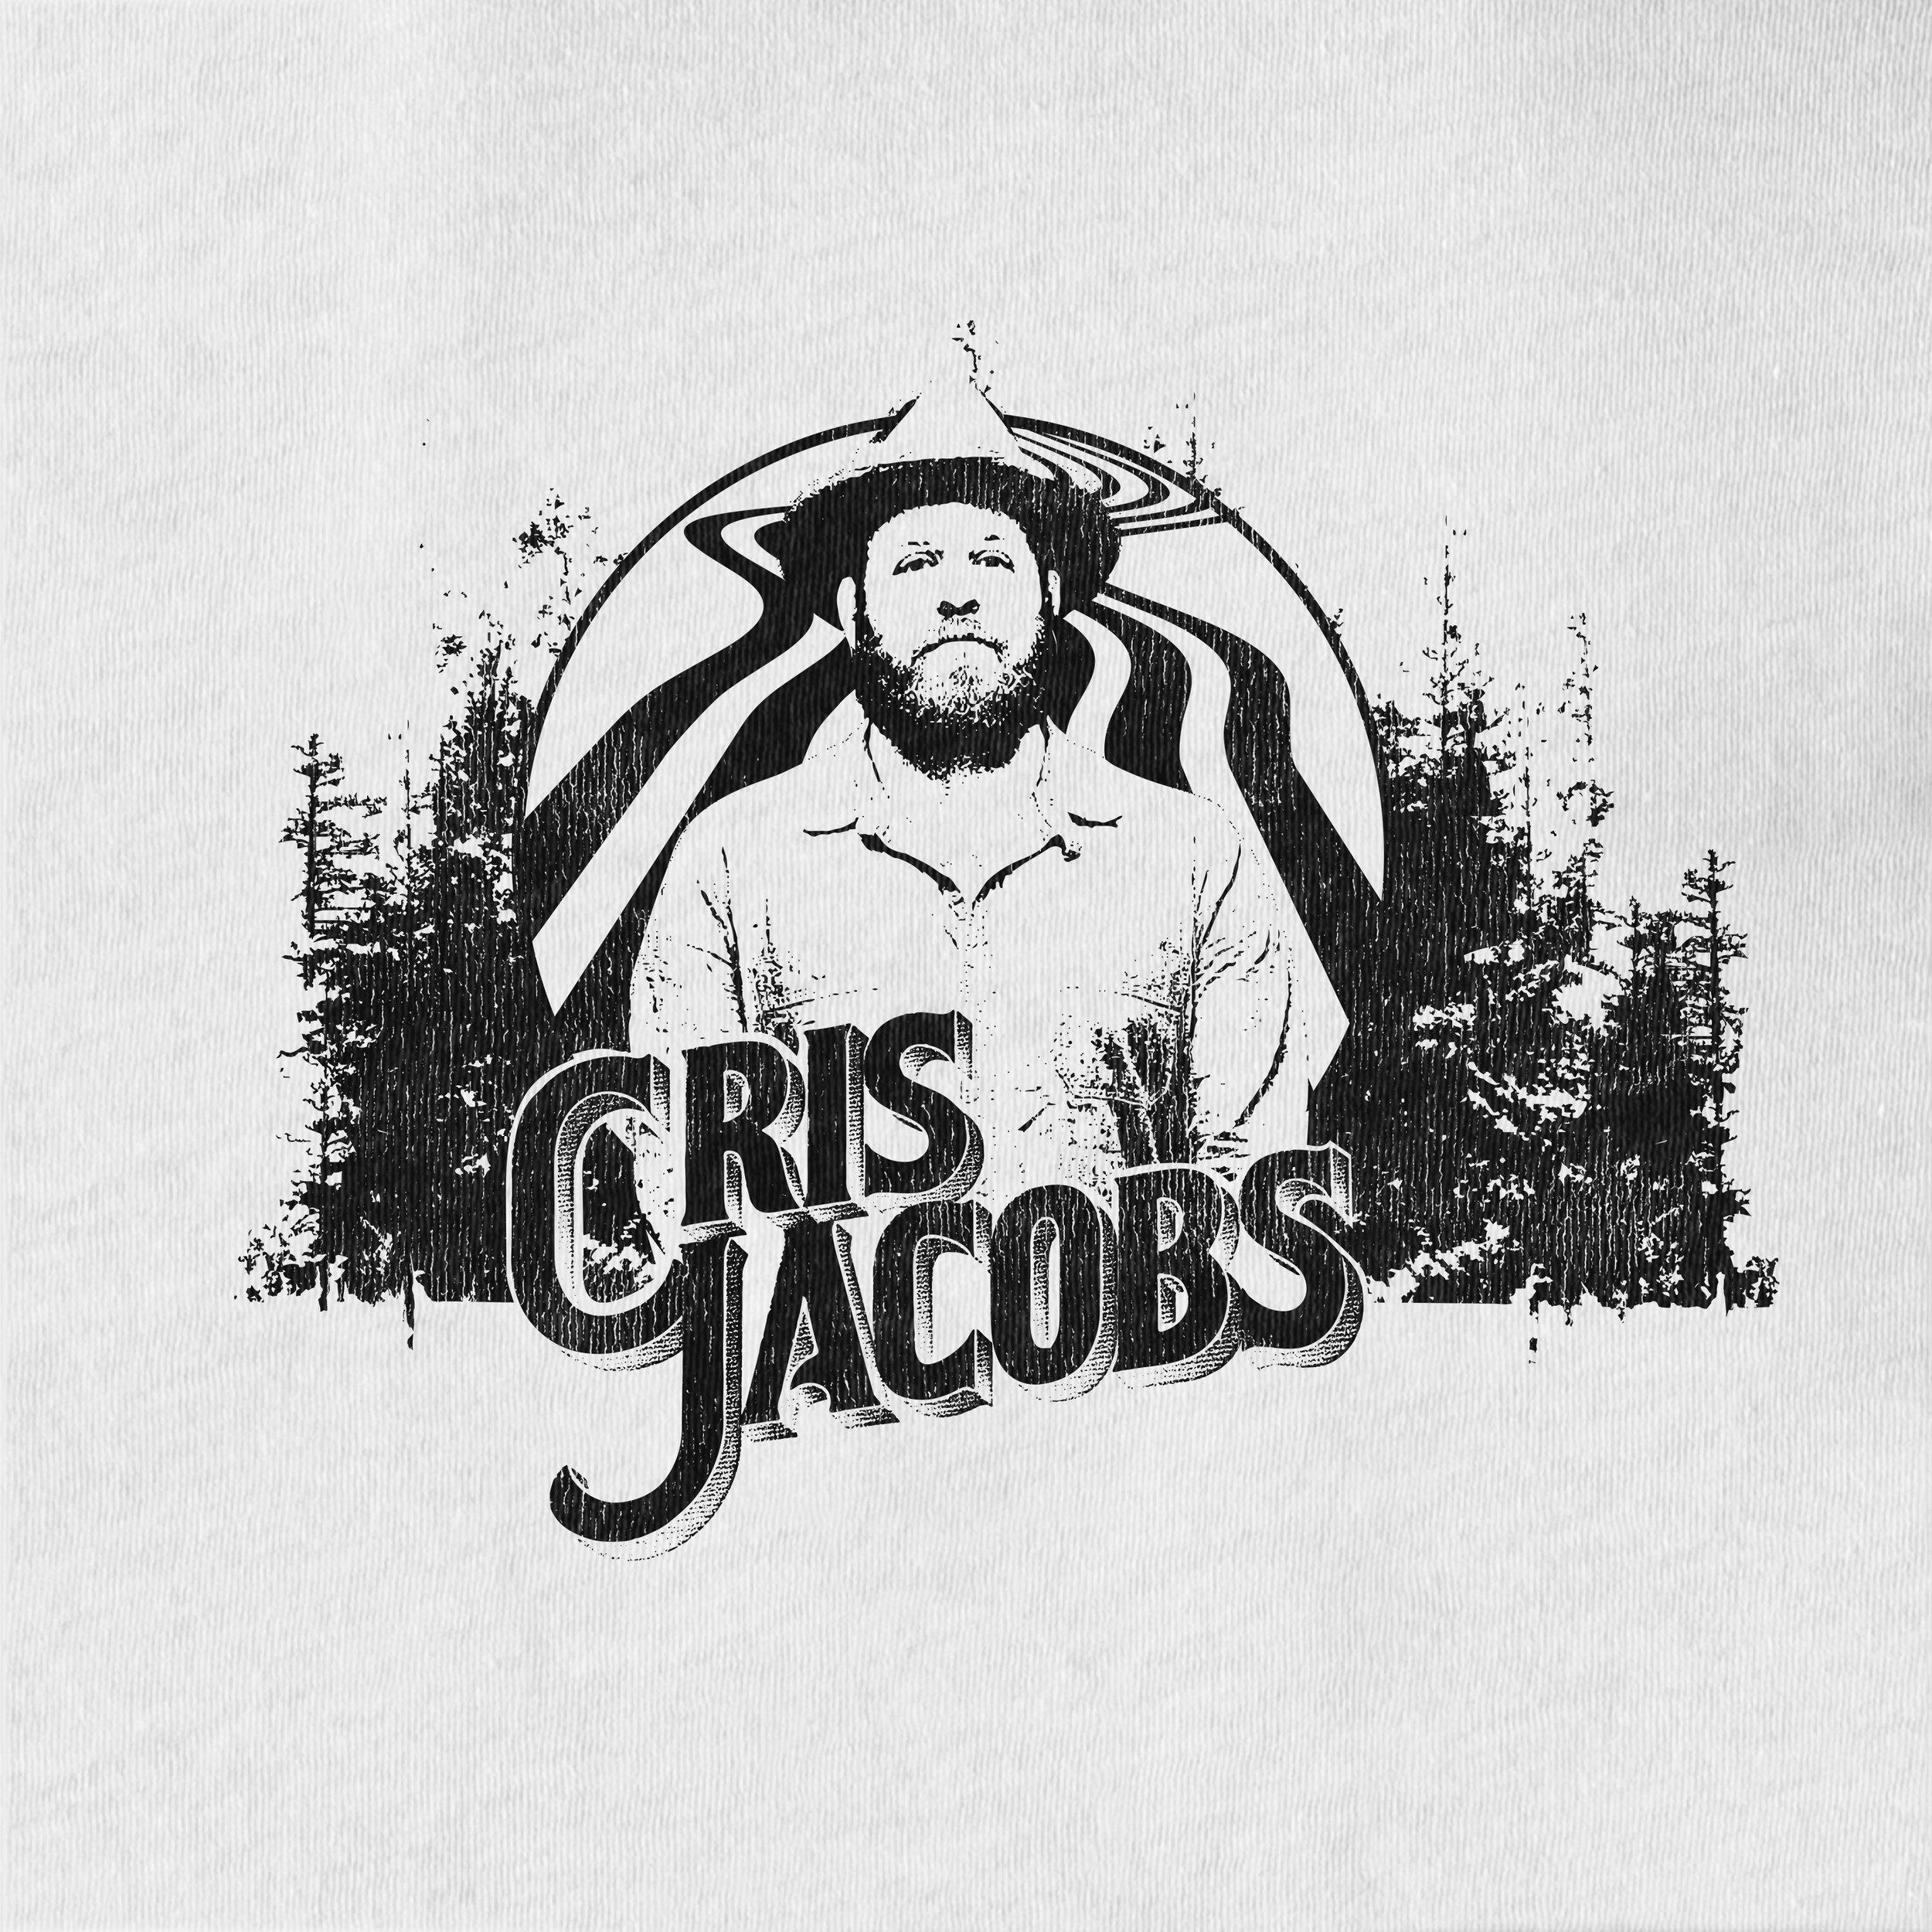 cris-jacobs-photo.jpg